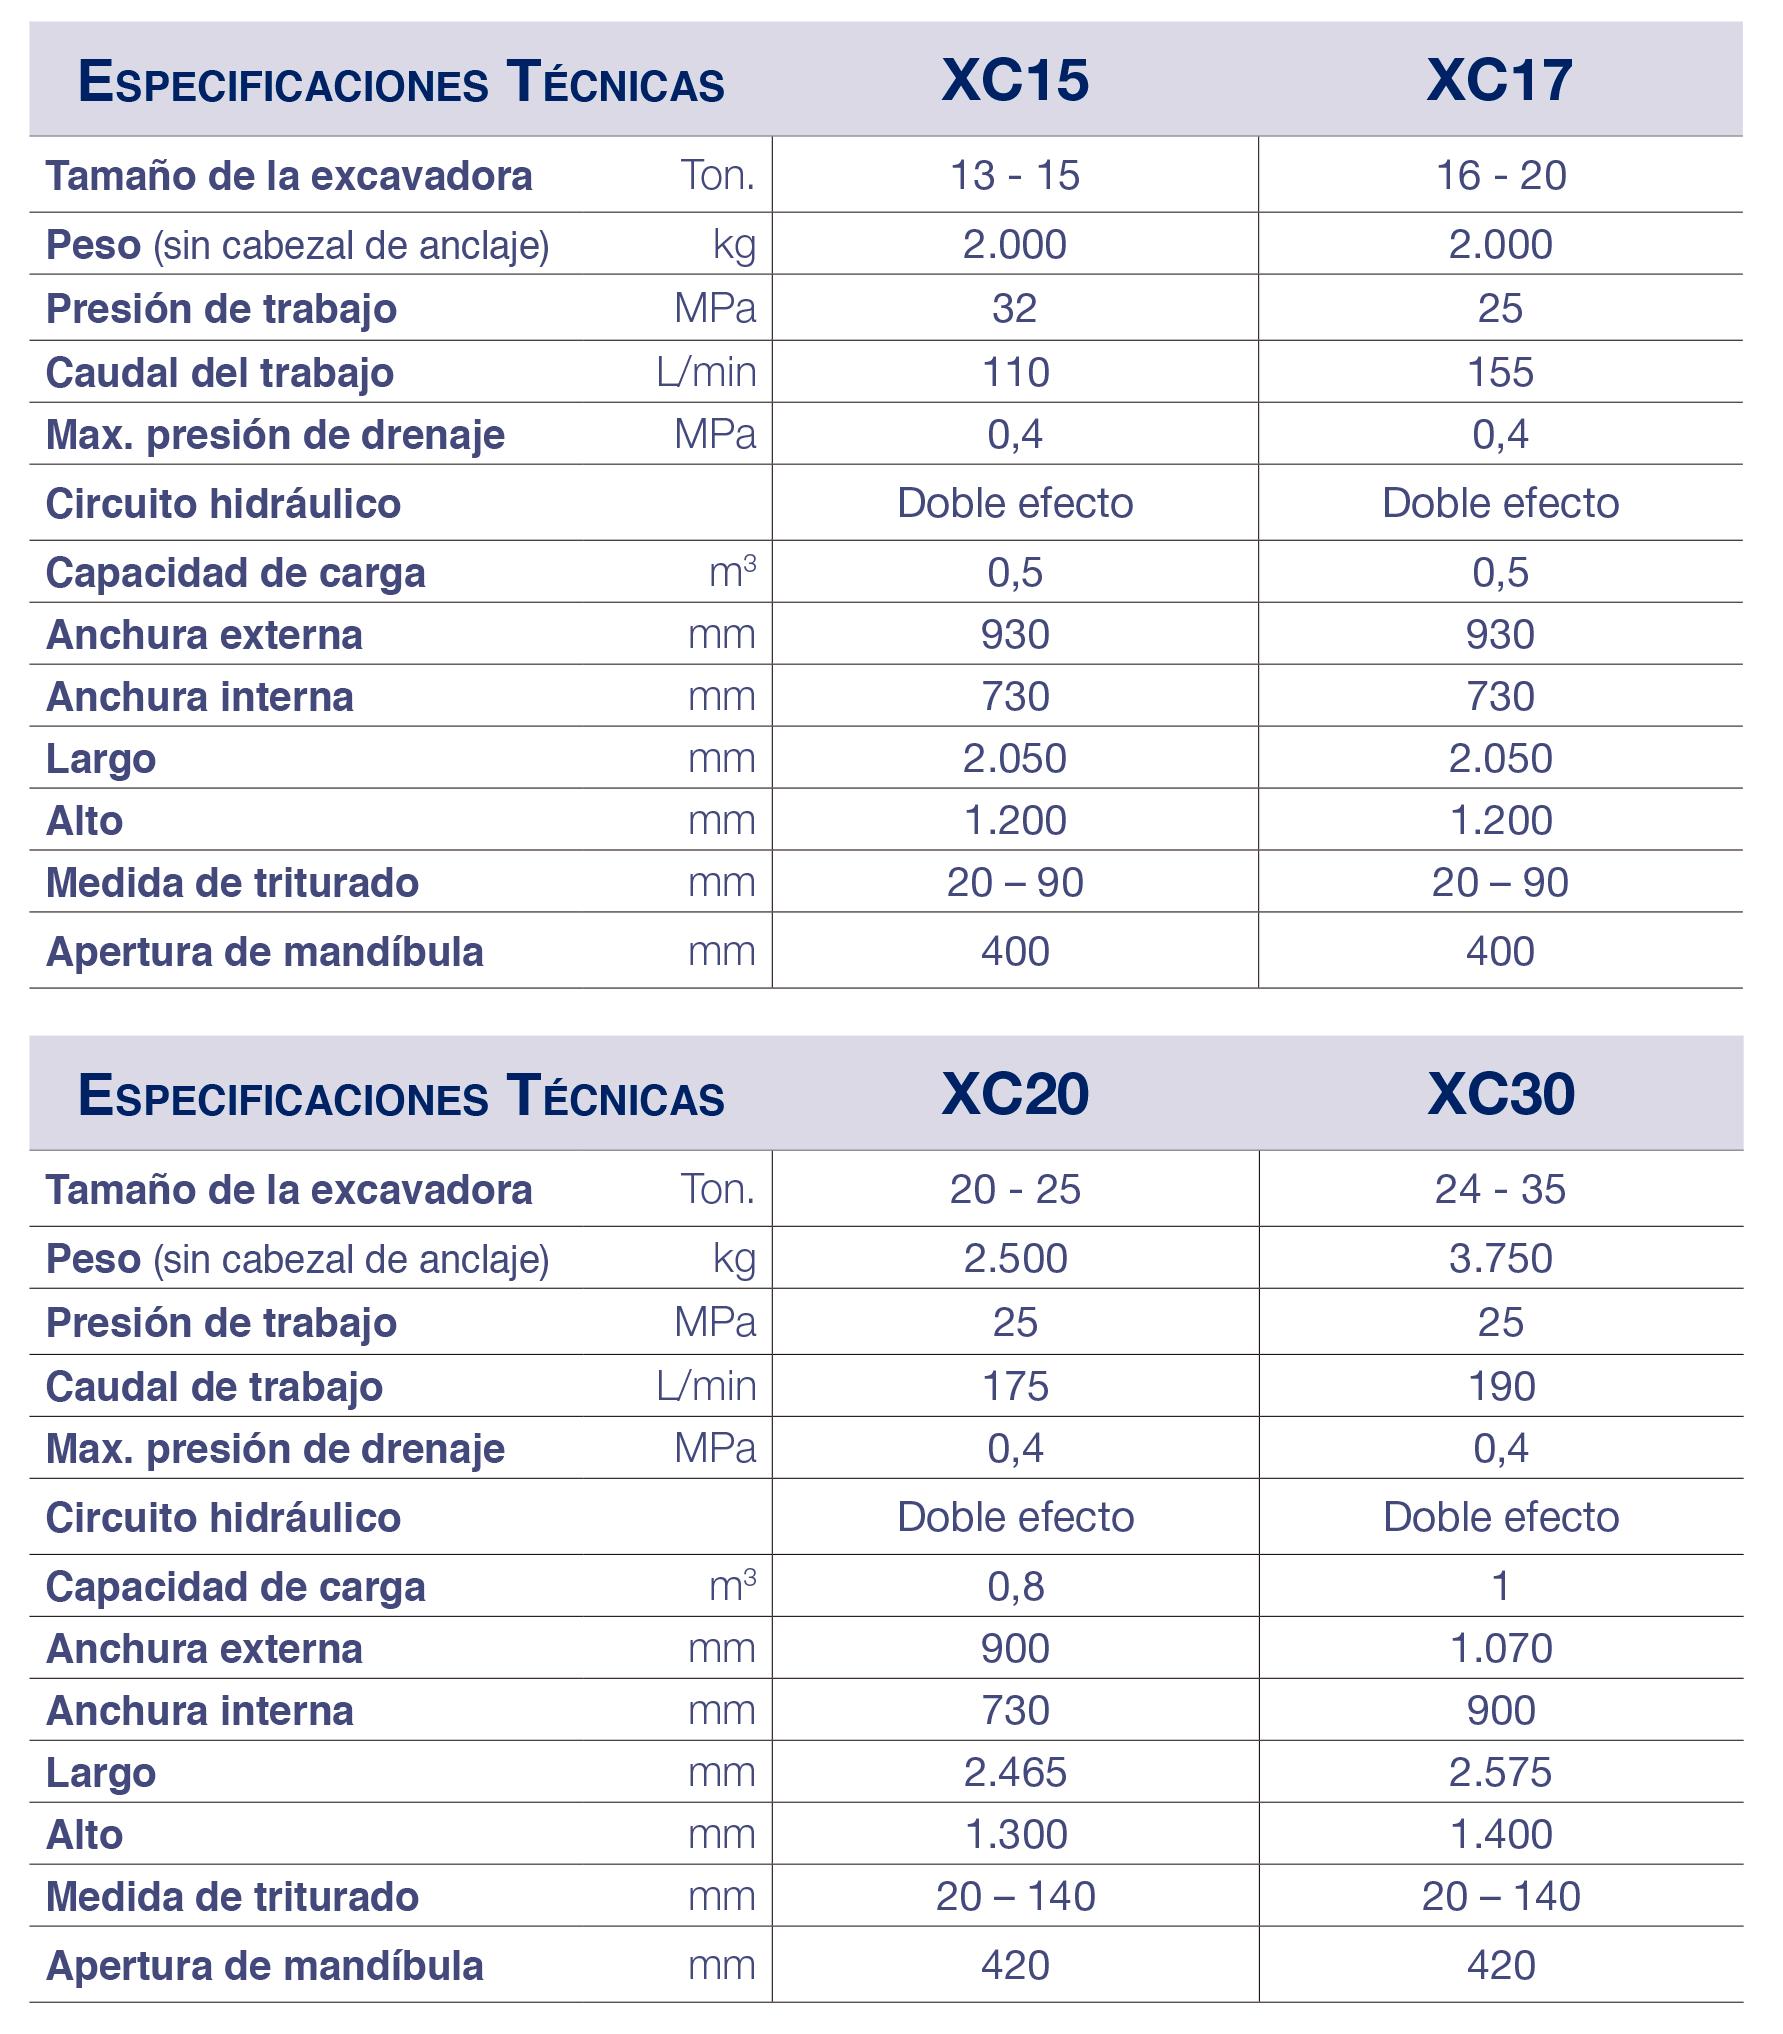 ESPECIFICACIONES TECNICAS XCENTRIC CRUSHER SERIE E